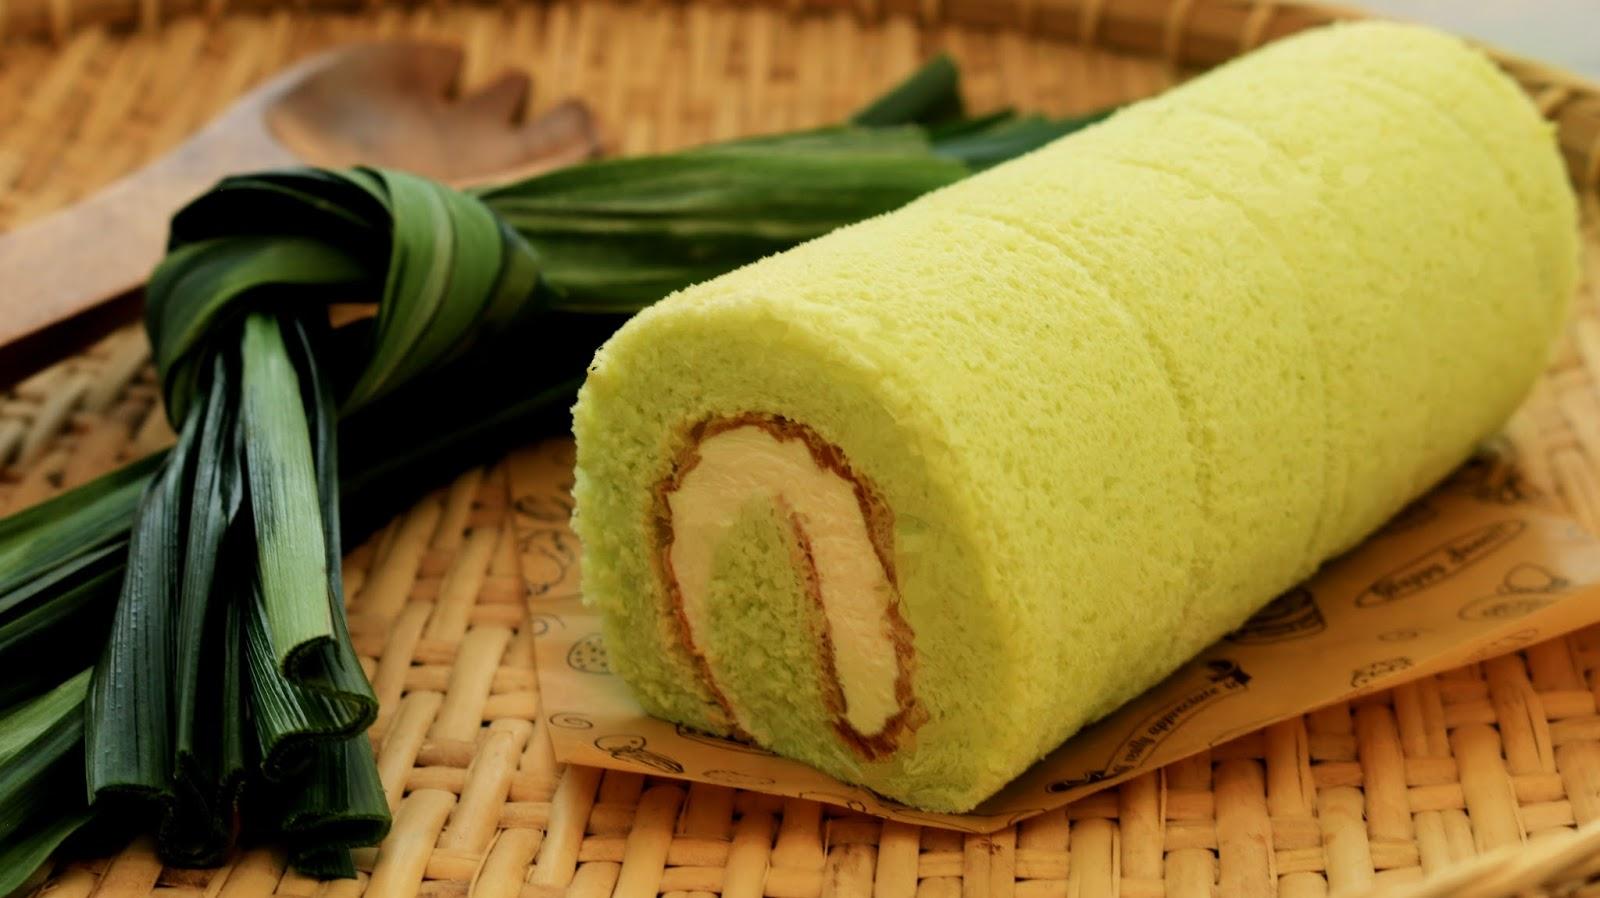 Josephine S Recipes How To Make Pandan Swiss Roll Cake 班兰瑞士蛋糕卷